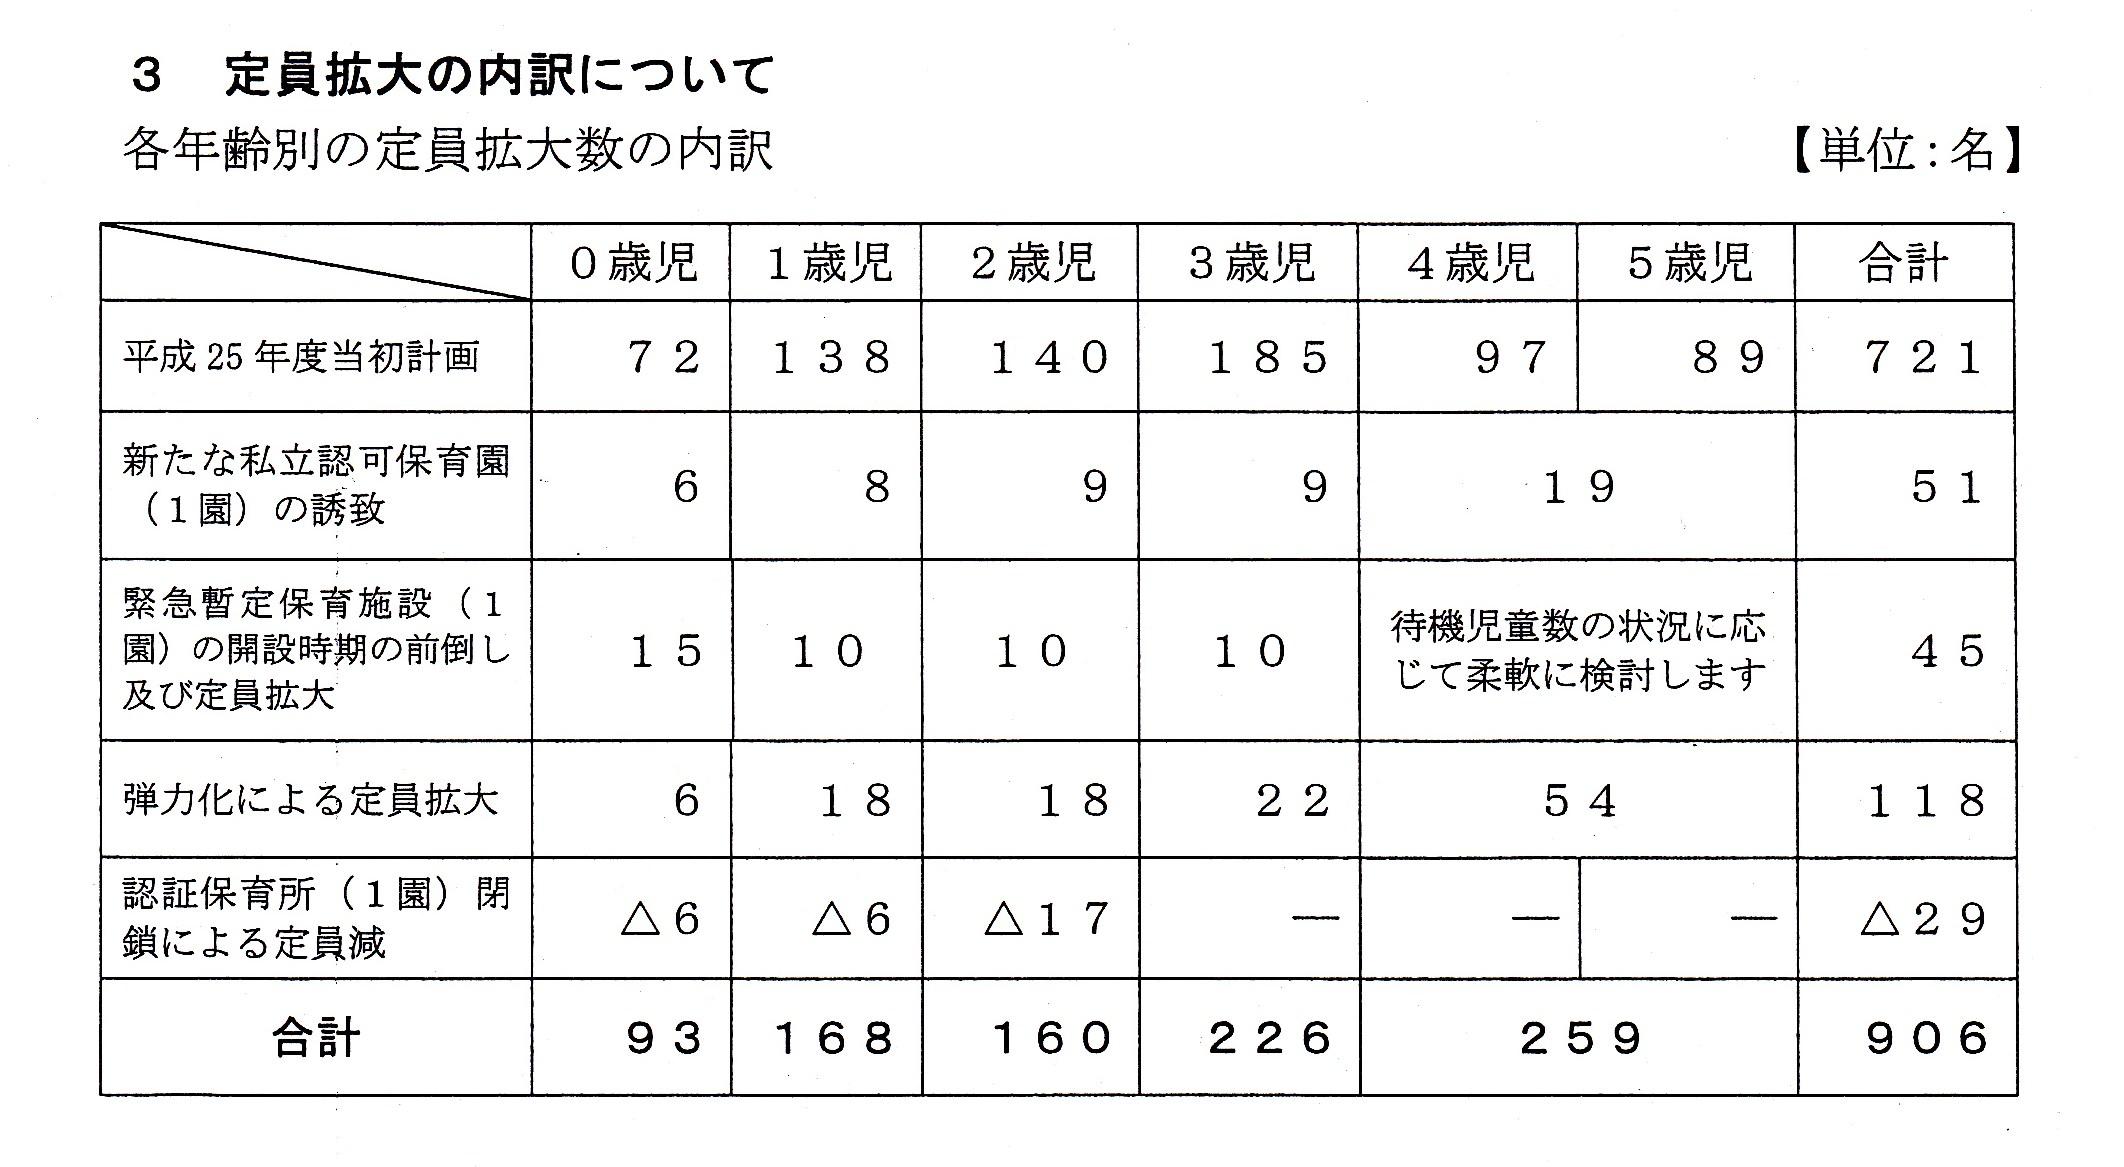 定員拡大の内訳.jpg